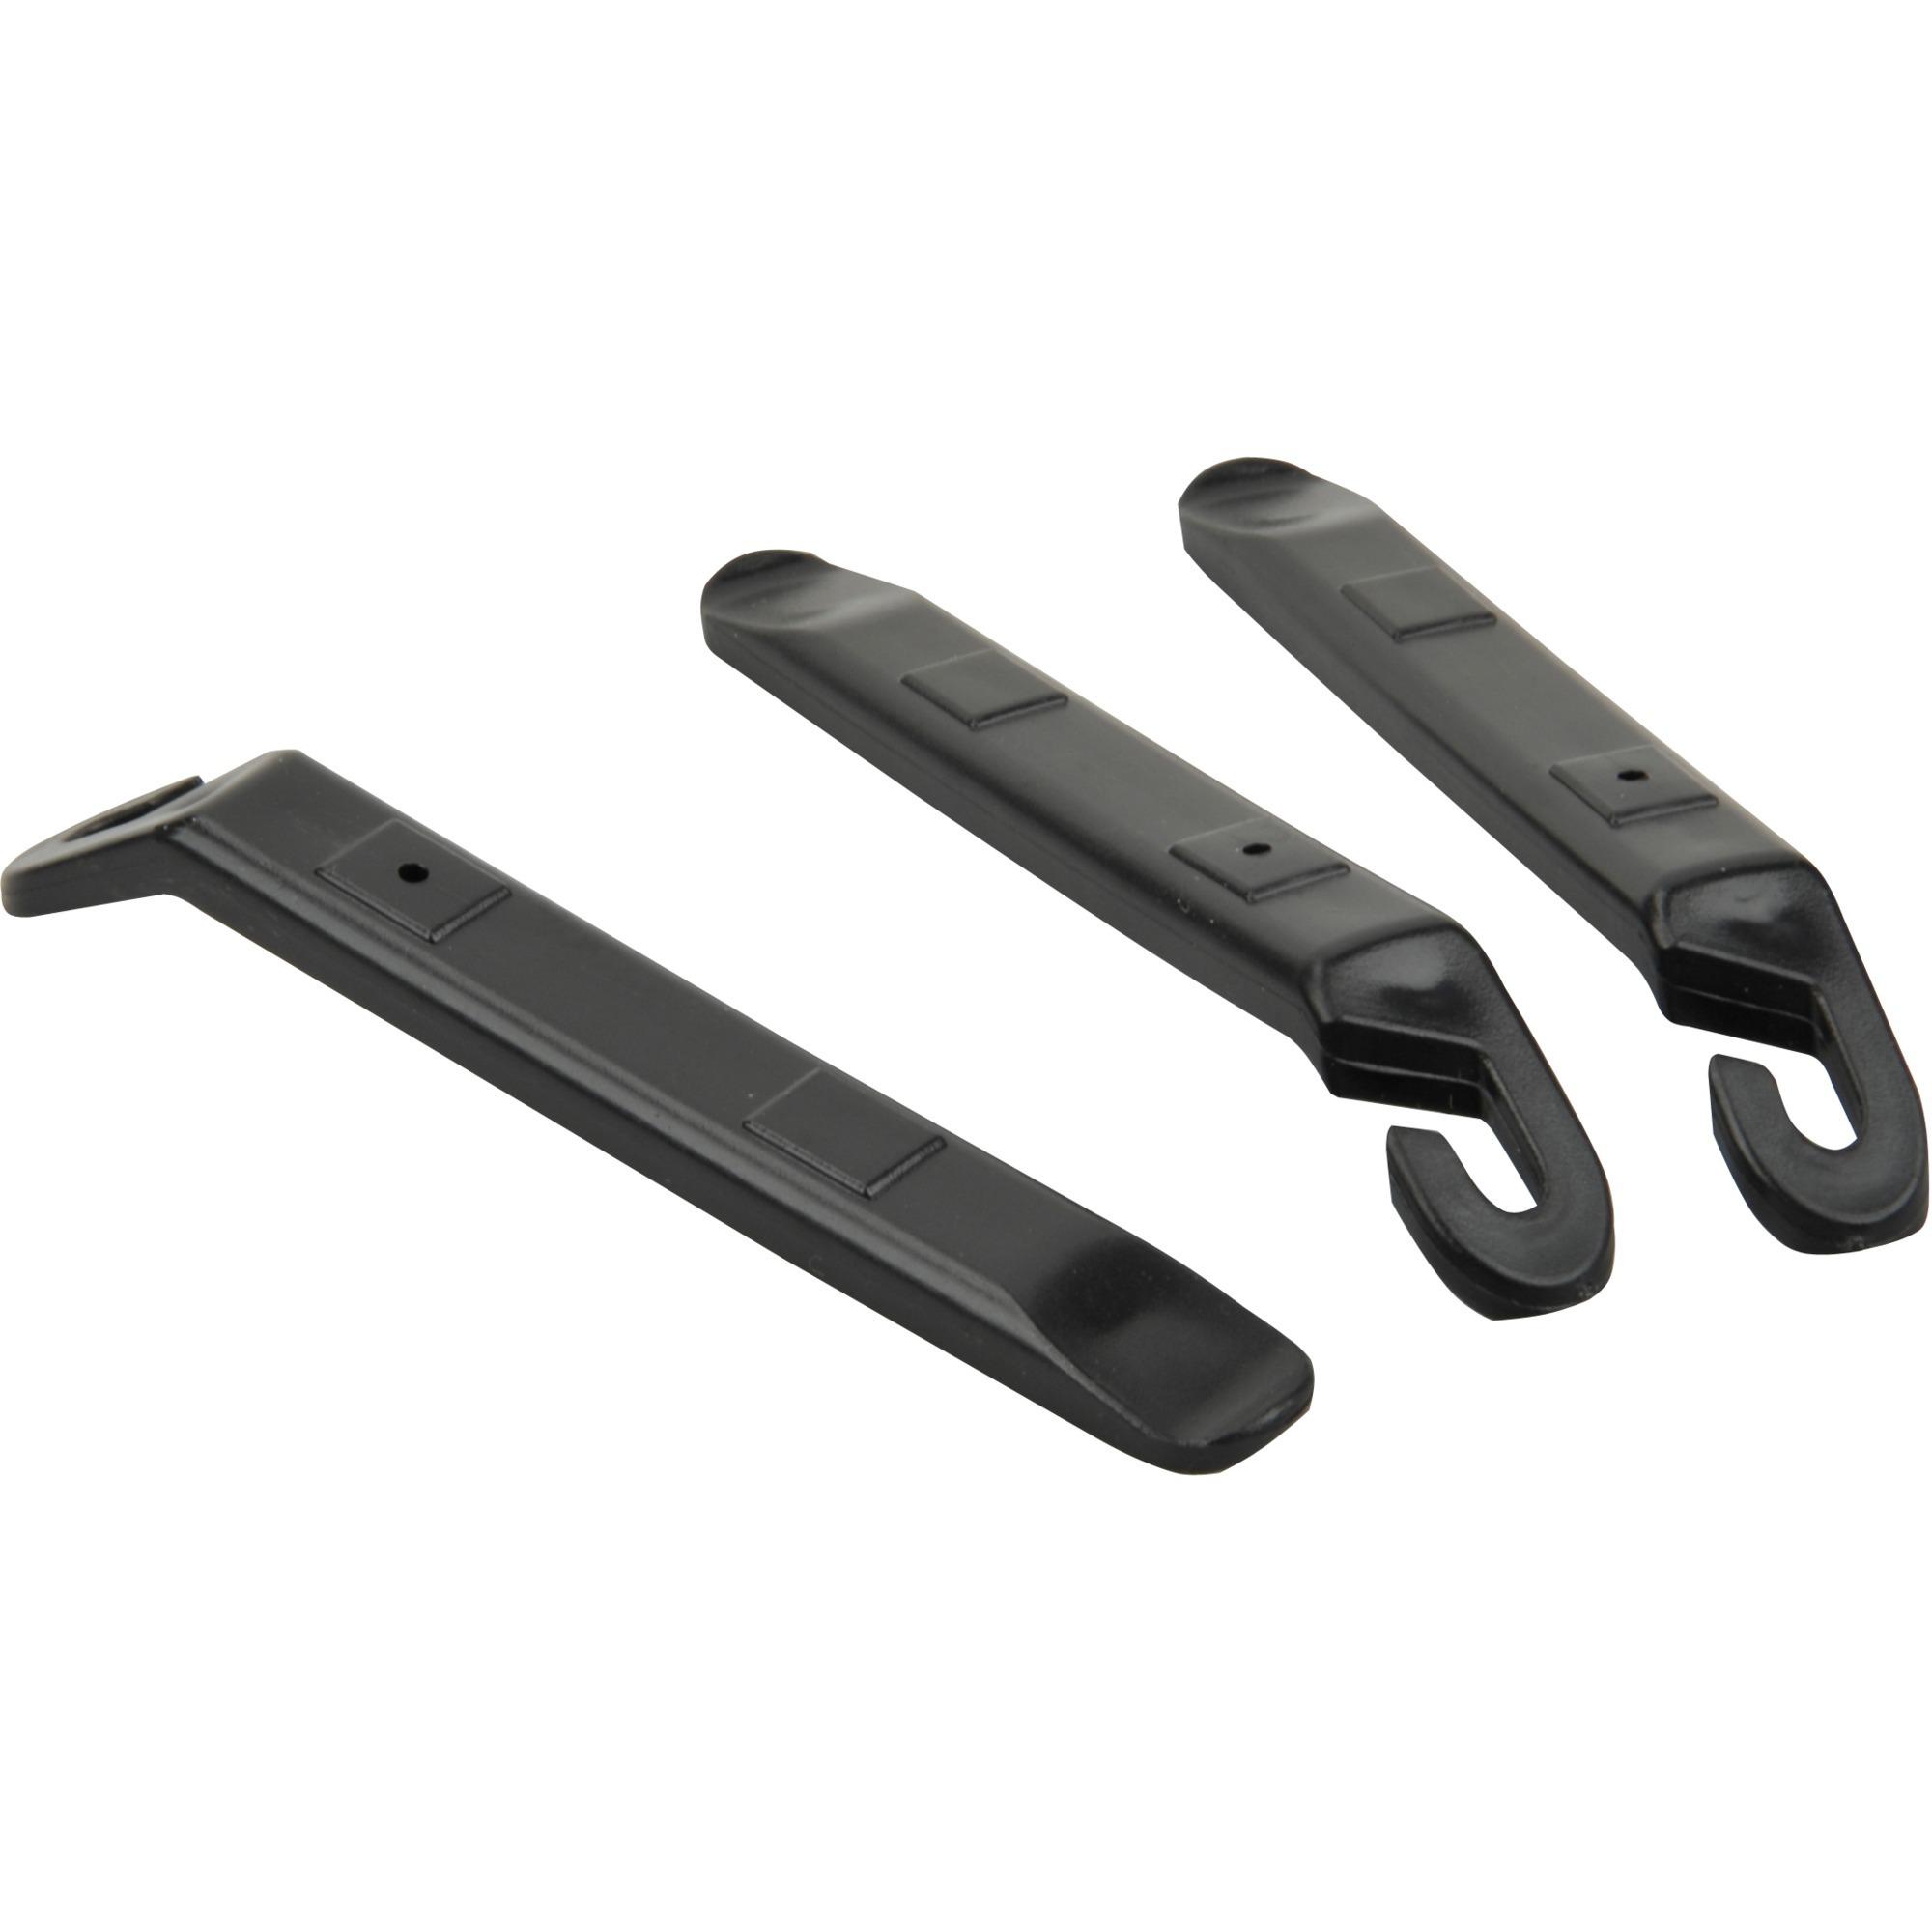 85515, Kit de herramientas